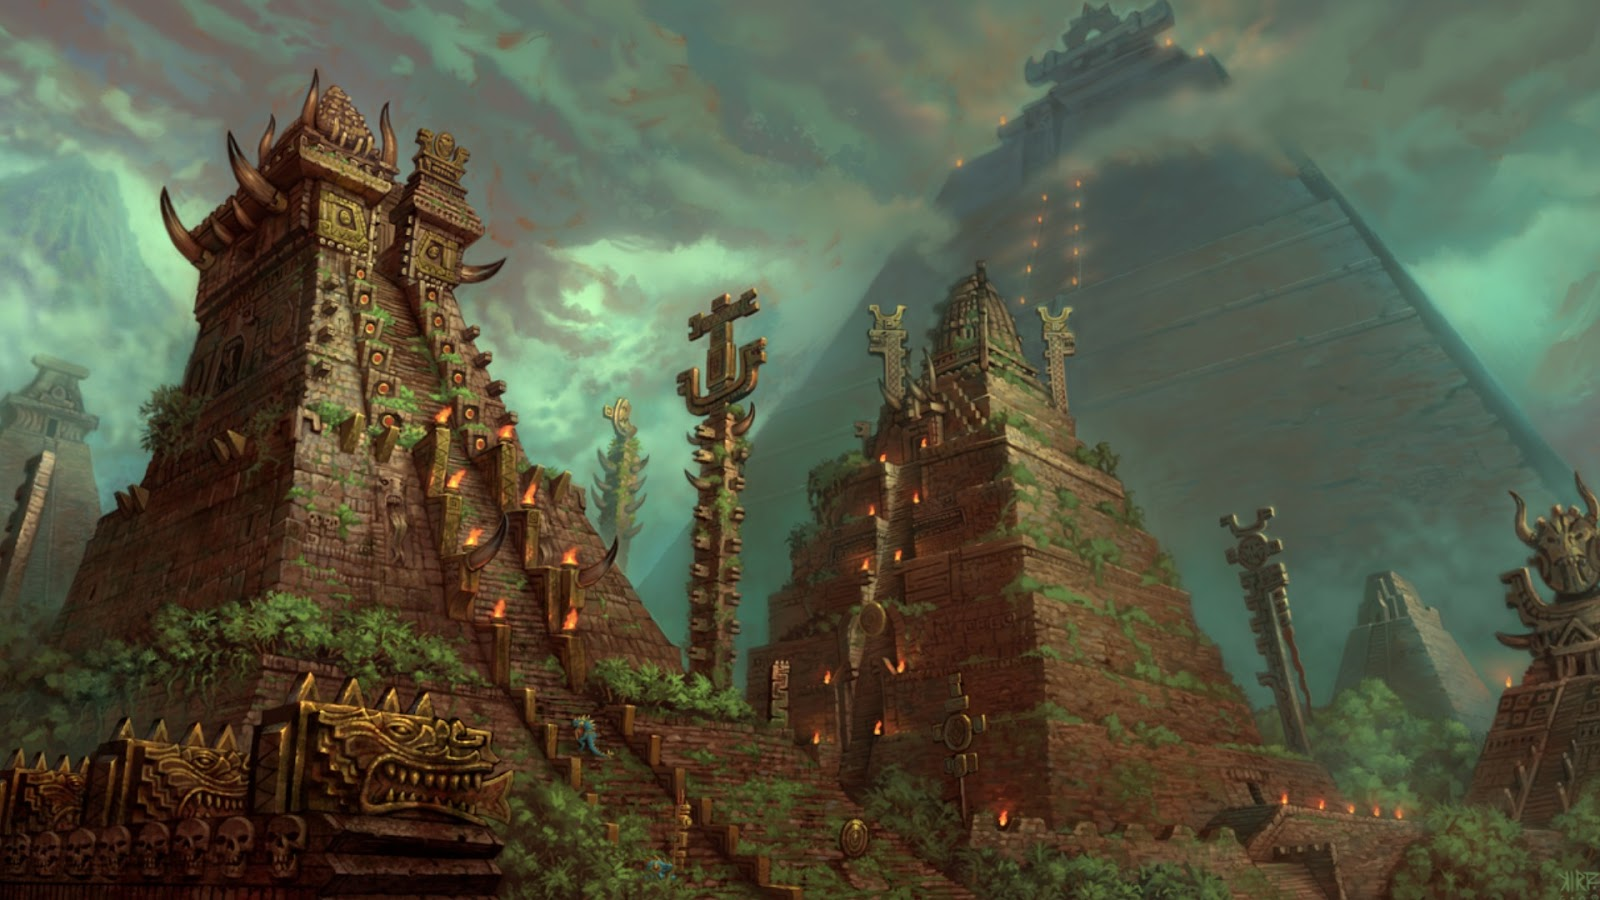 Fantasy_art_aztec_lizard_men_1920x1080_19885.jpg